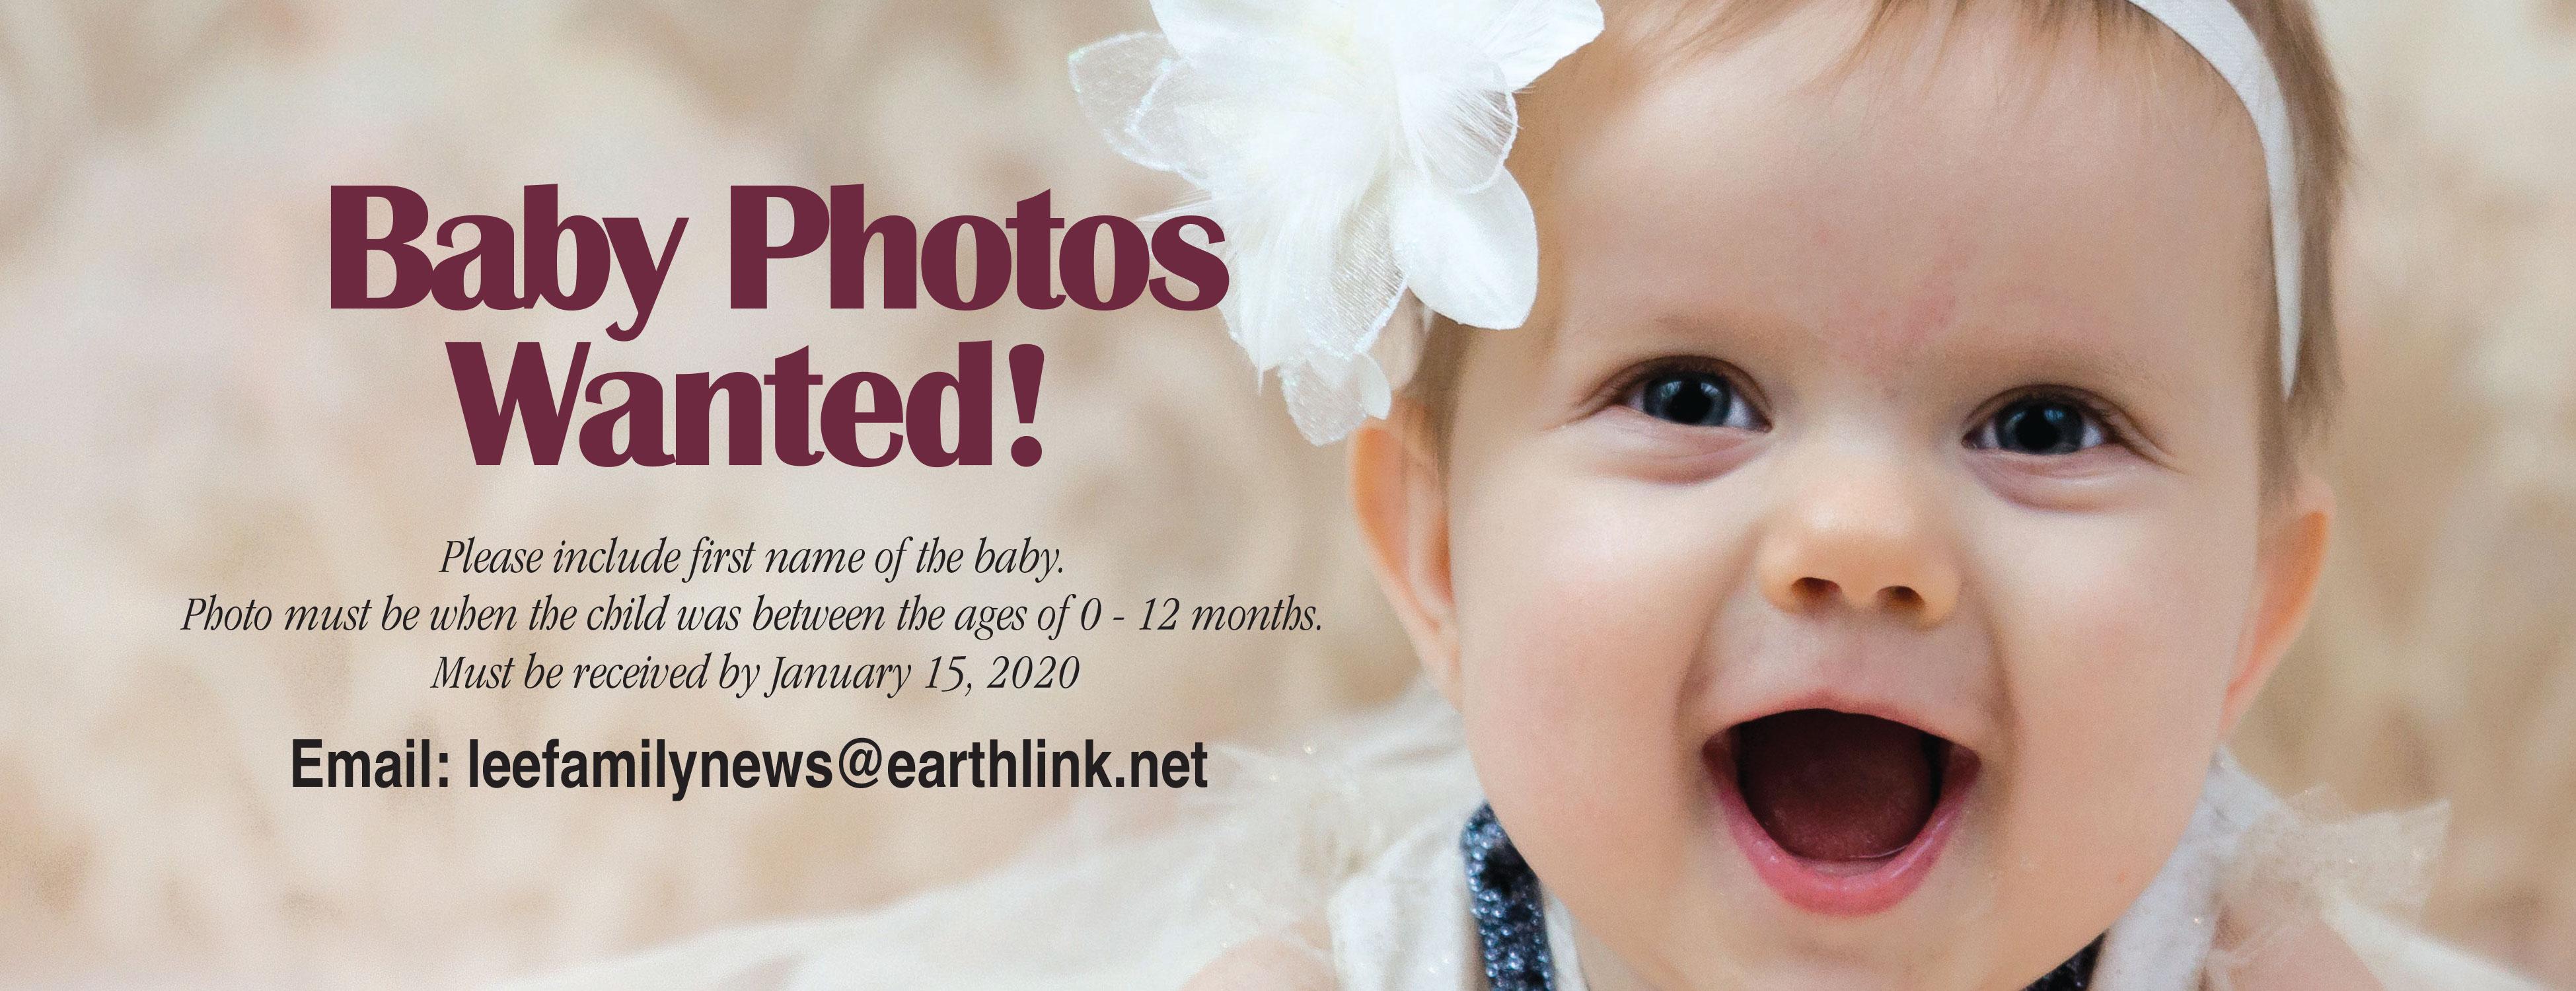 We Need Baby Photos!!!!!